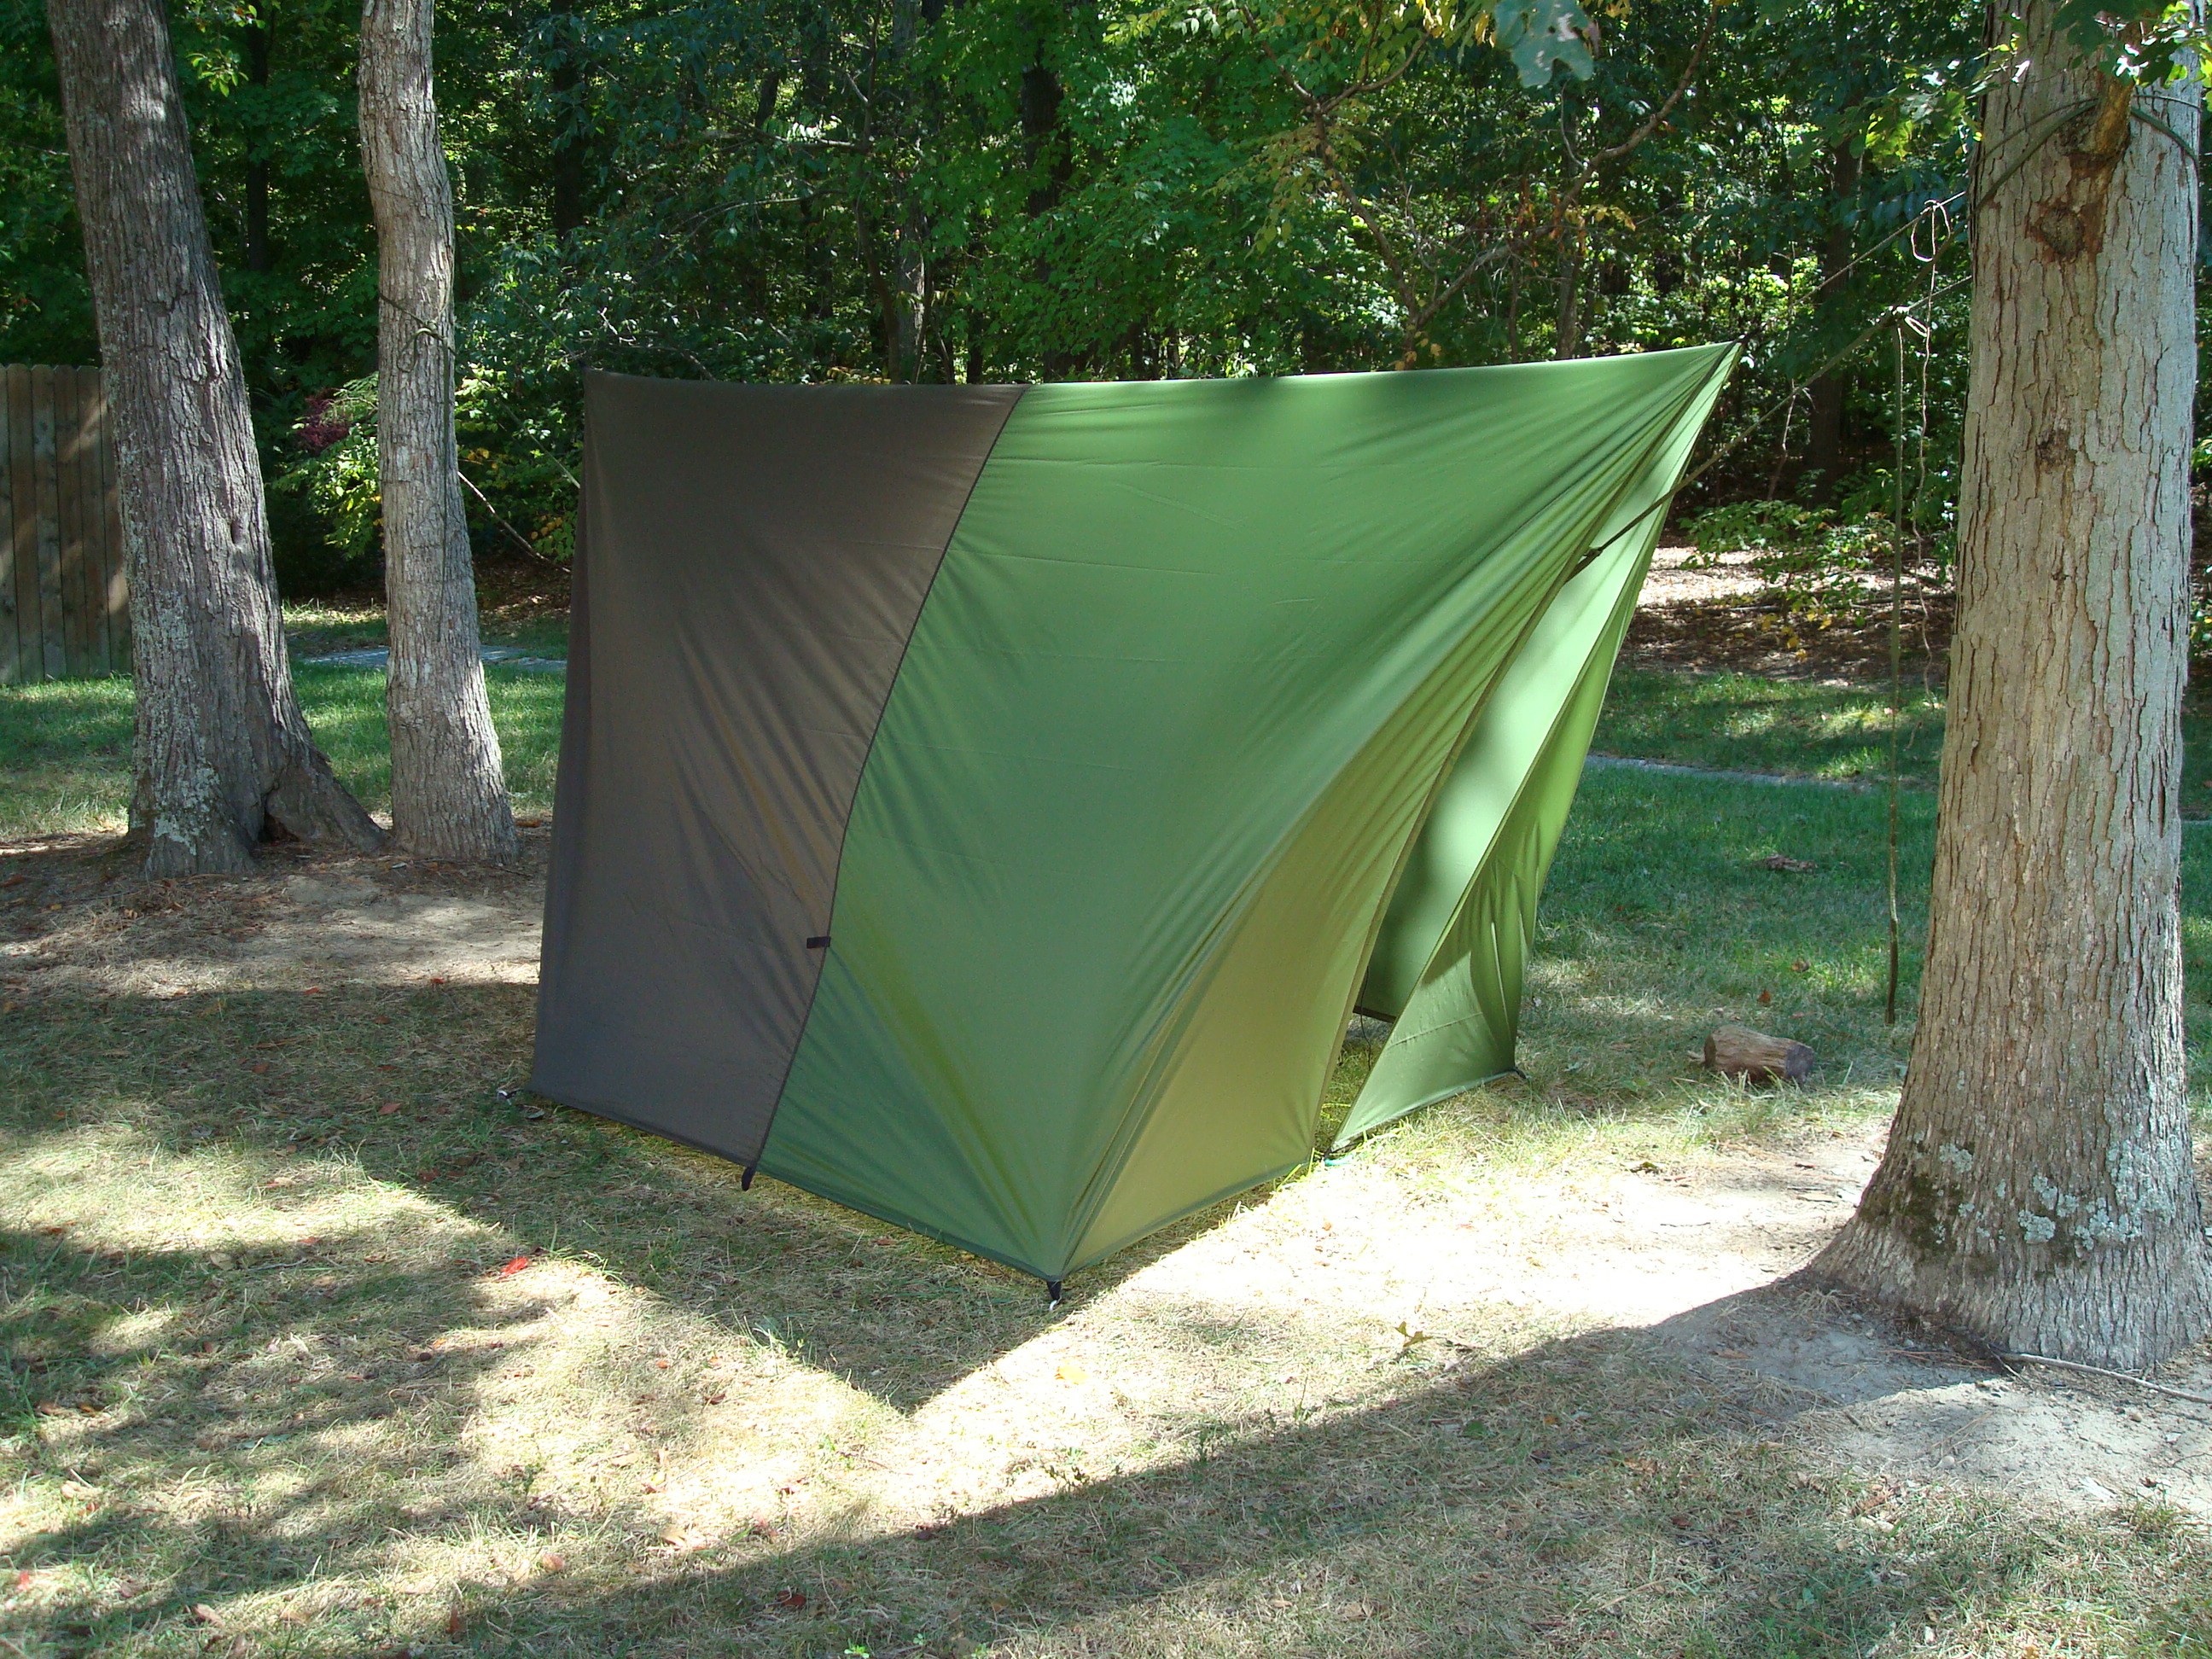 jrb 11 x 10 cat tarp around a claytor mosquito hammock jrb 11 x 10 cat tarp around a claytor mosquito hammock   hammock      rh   hammockforums